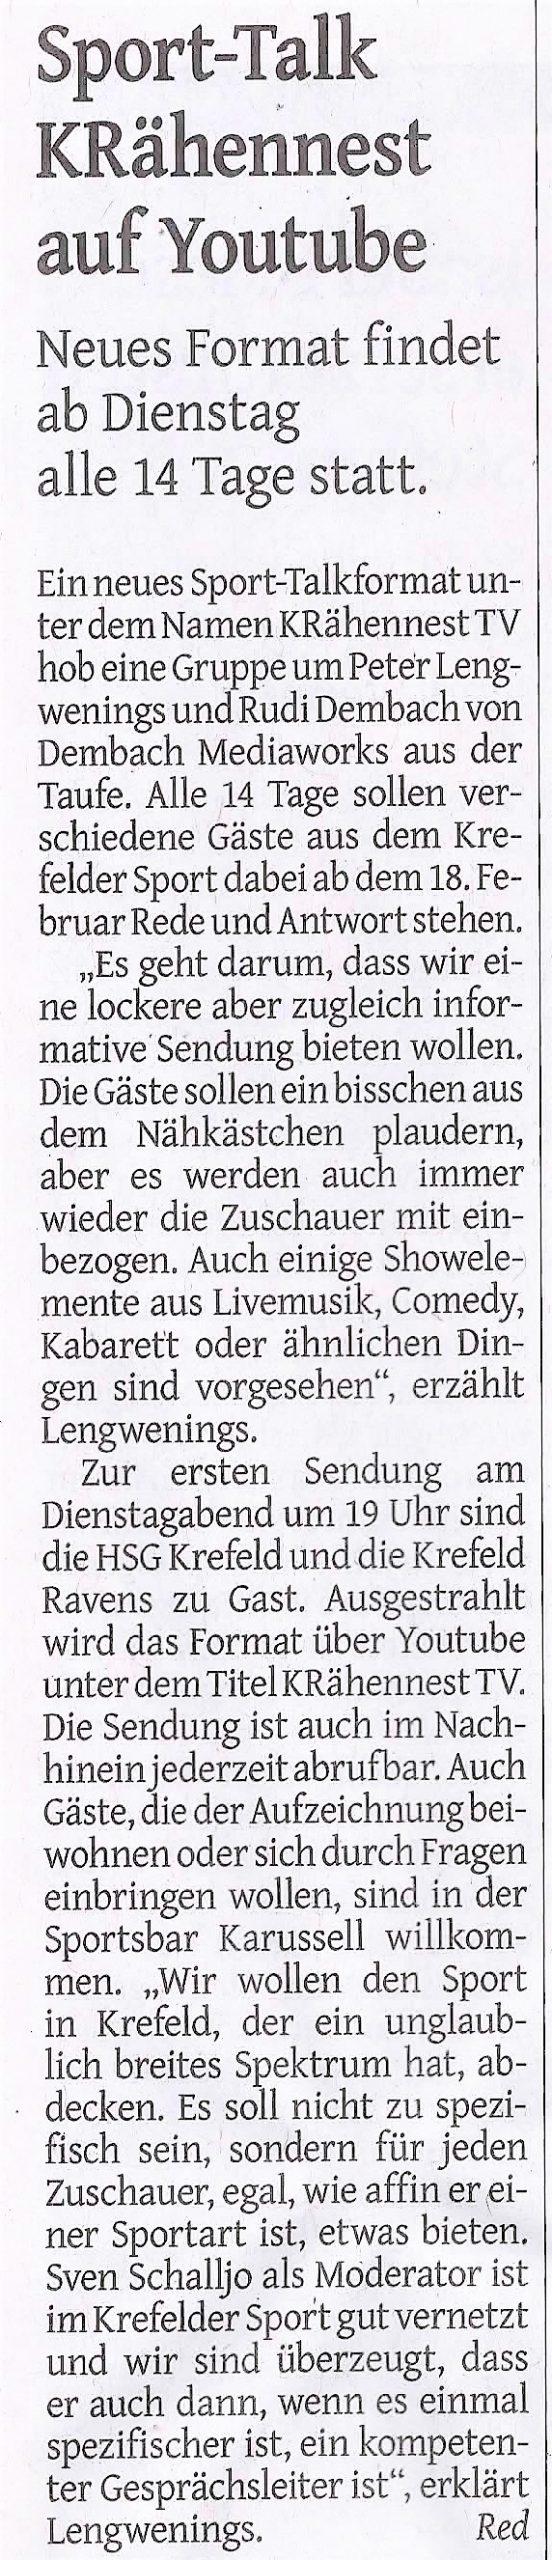 Westdeutsche_Zeitung_17022020